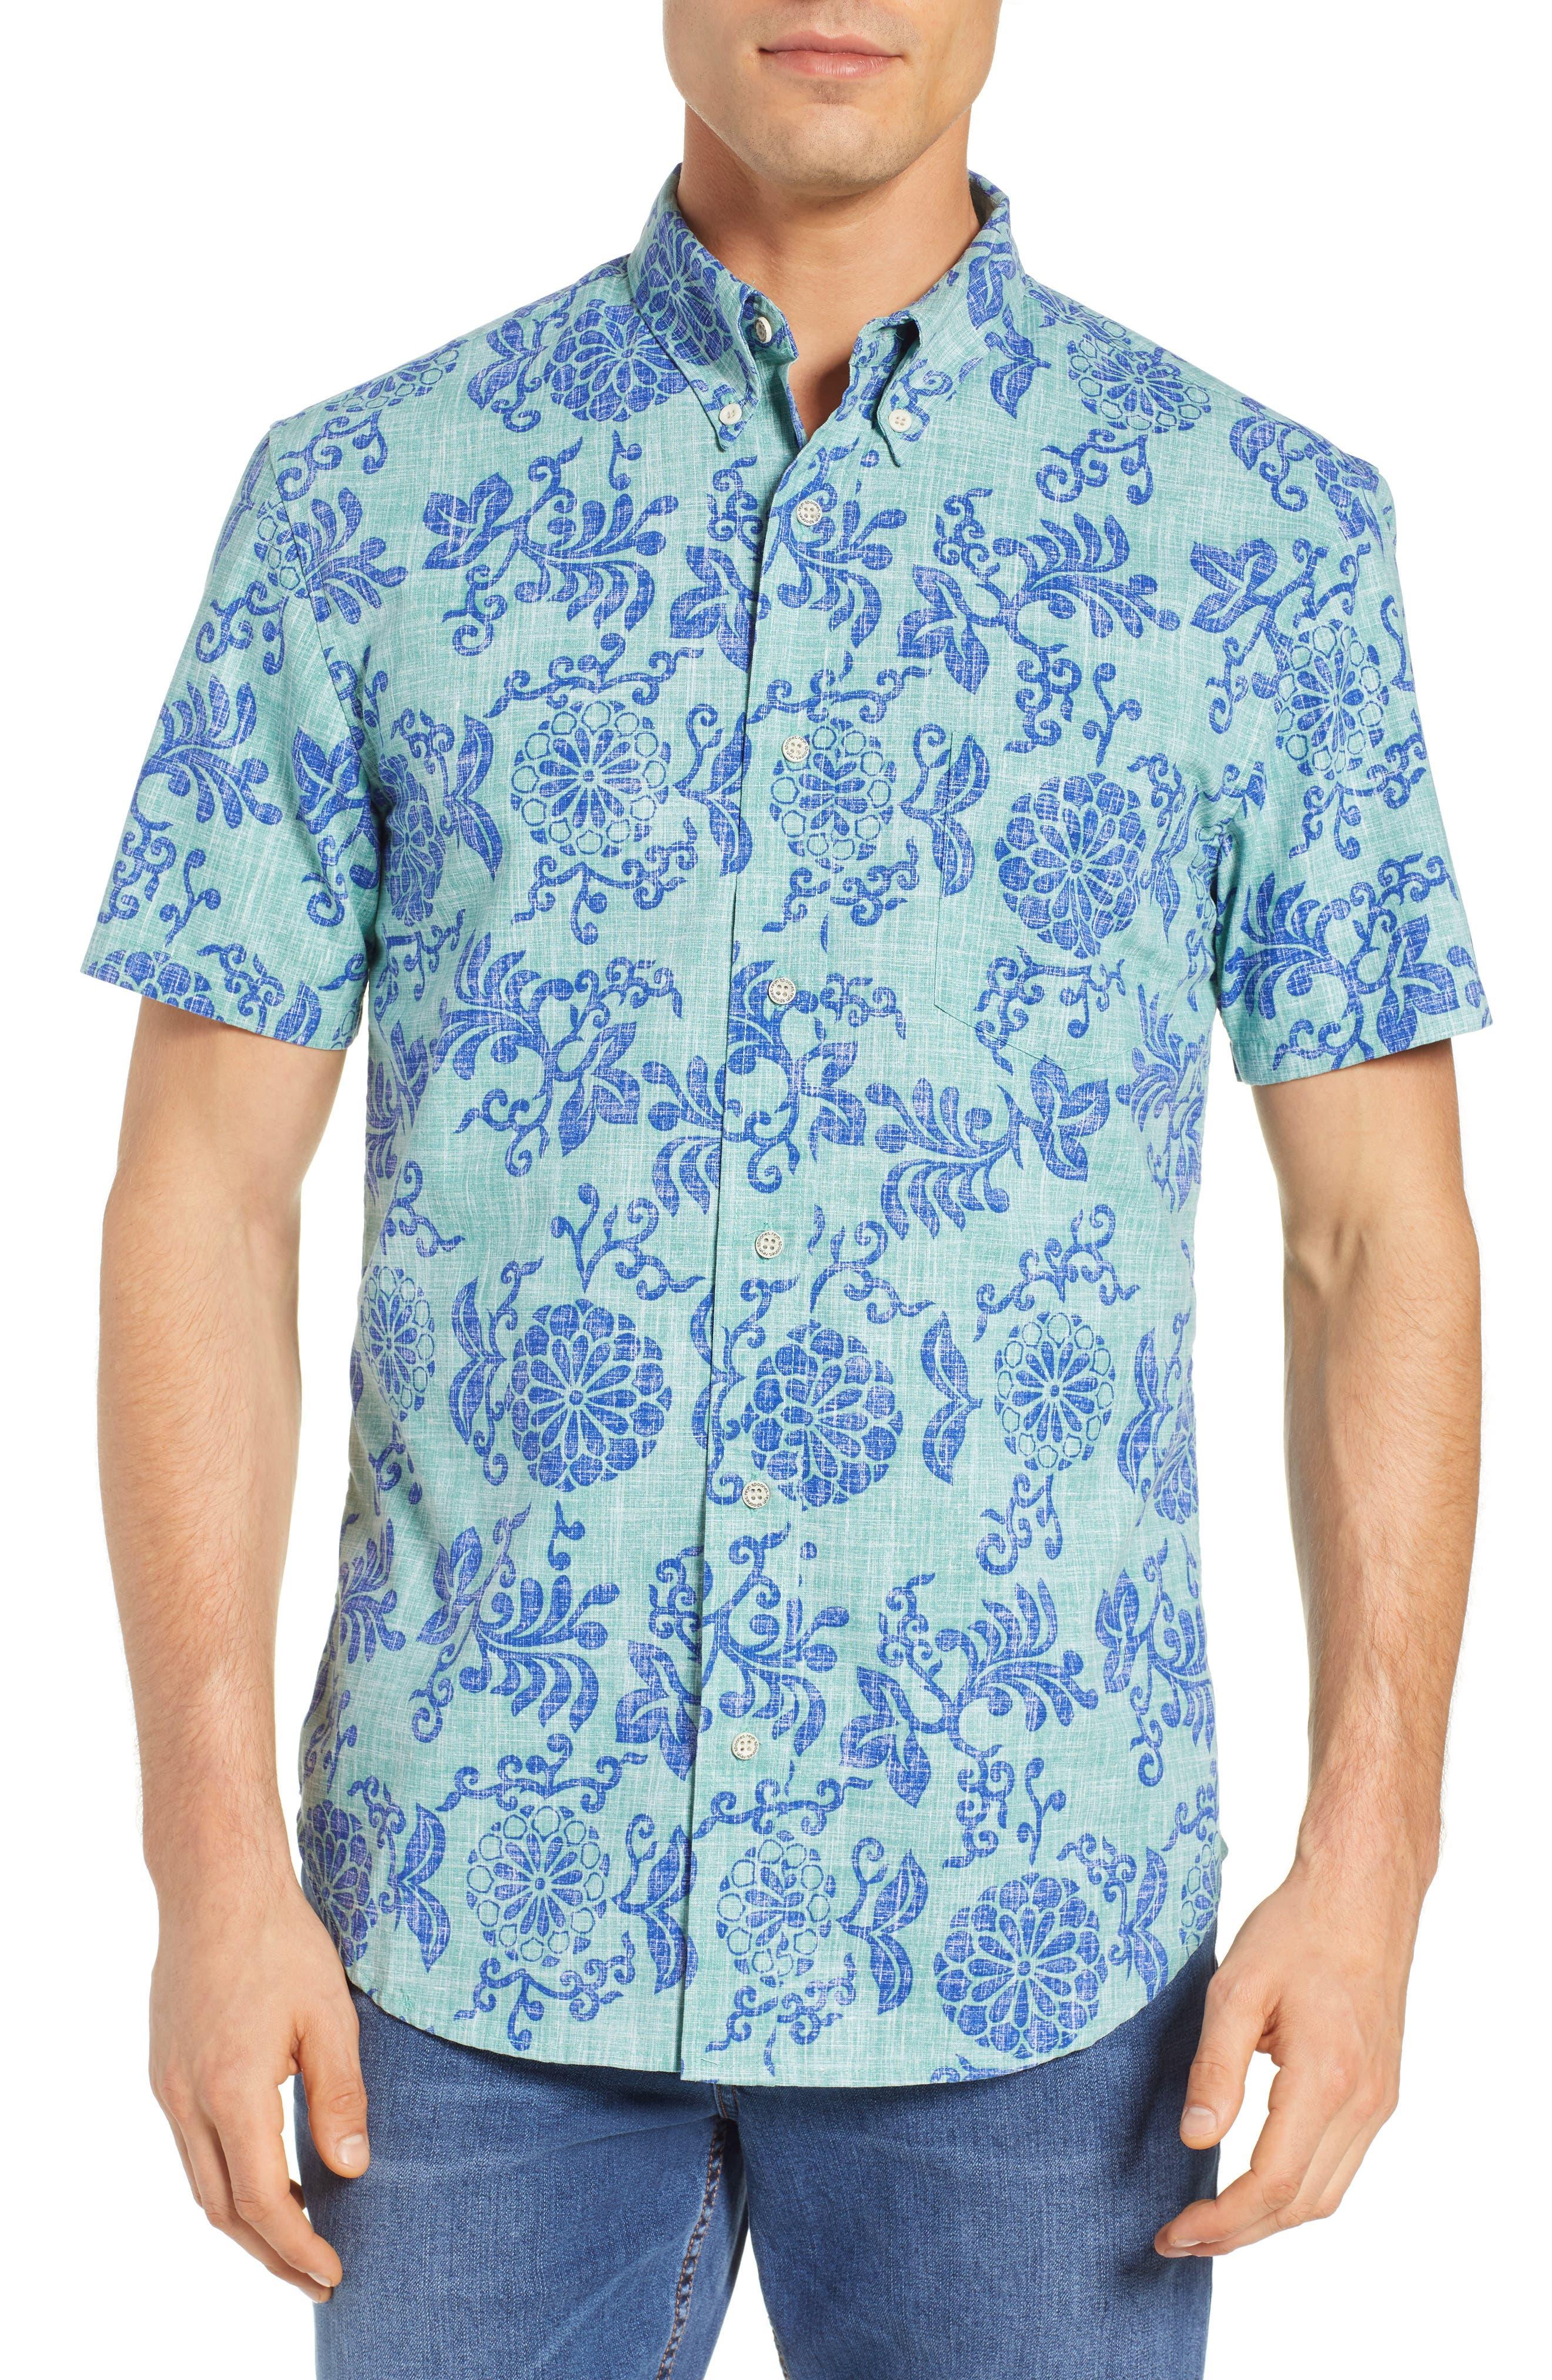 REYN SPOONER Royal Chrysanthemums Regular Fit Sport Shirt, Main, color, 310